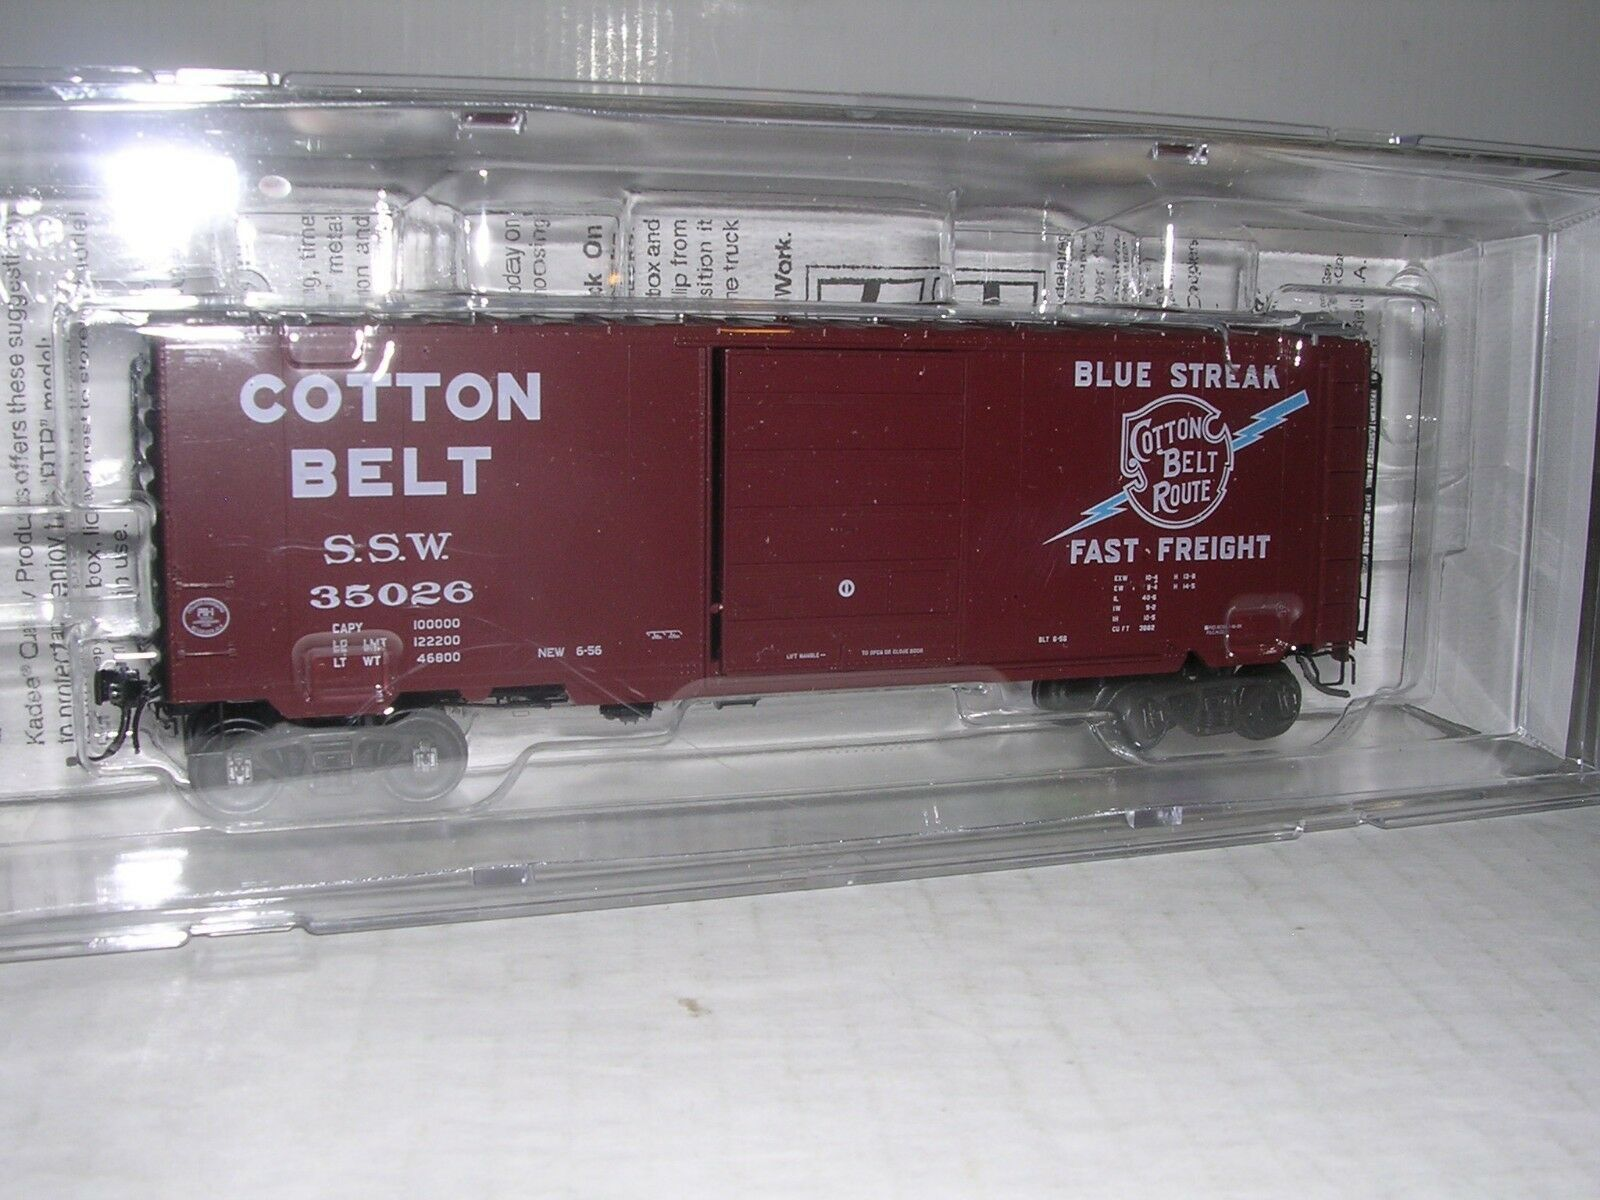 KADEE S.S.W.Cotton Belt 40' PS-1 Box Car H.O.Scale 1 87